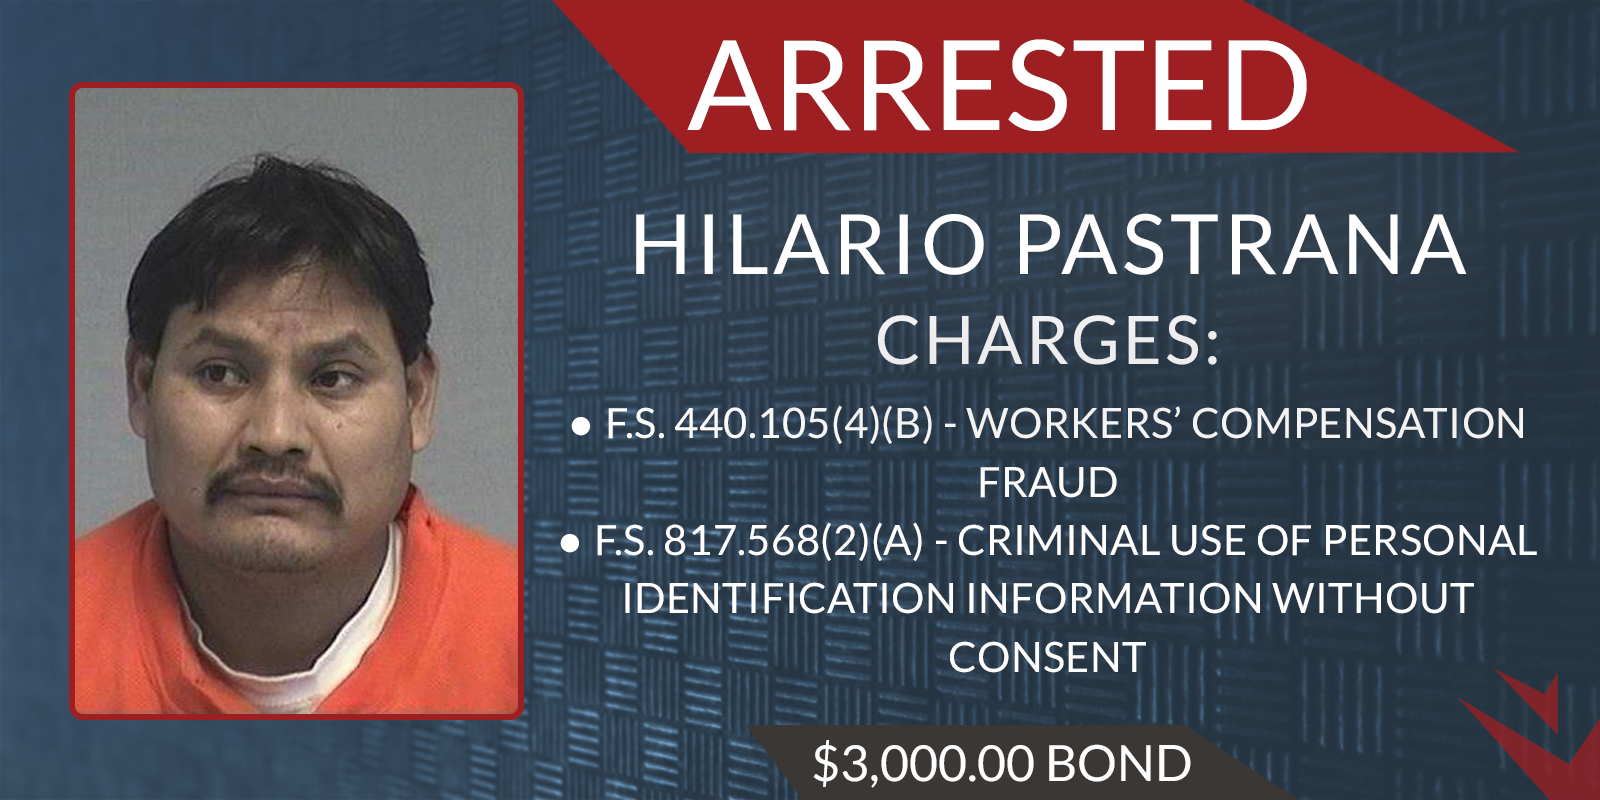 Hilario Pastrana Arrested